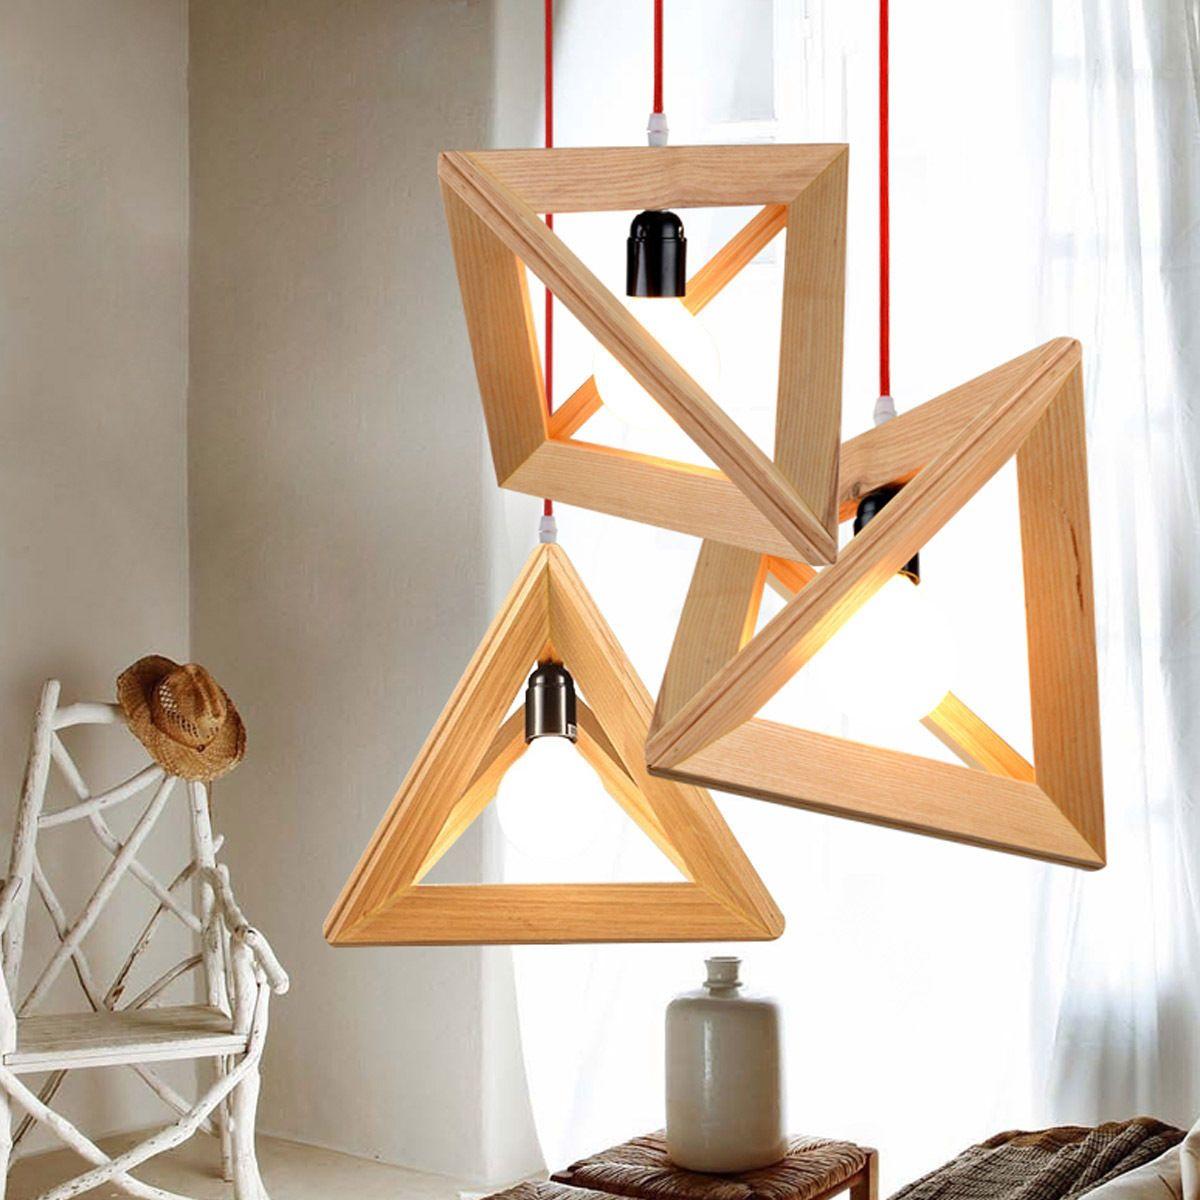 chandelier antique custom recangle modern wood vintage shades furniture metal diy farmhouse with hanging ideas table